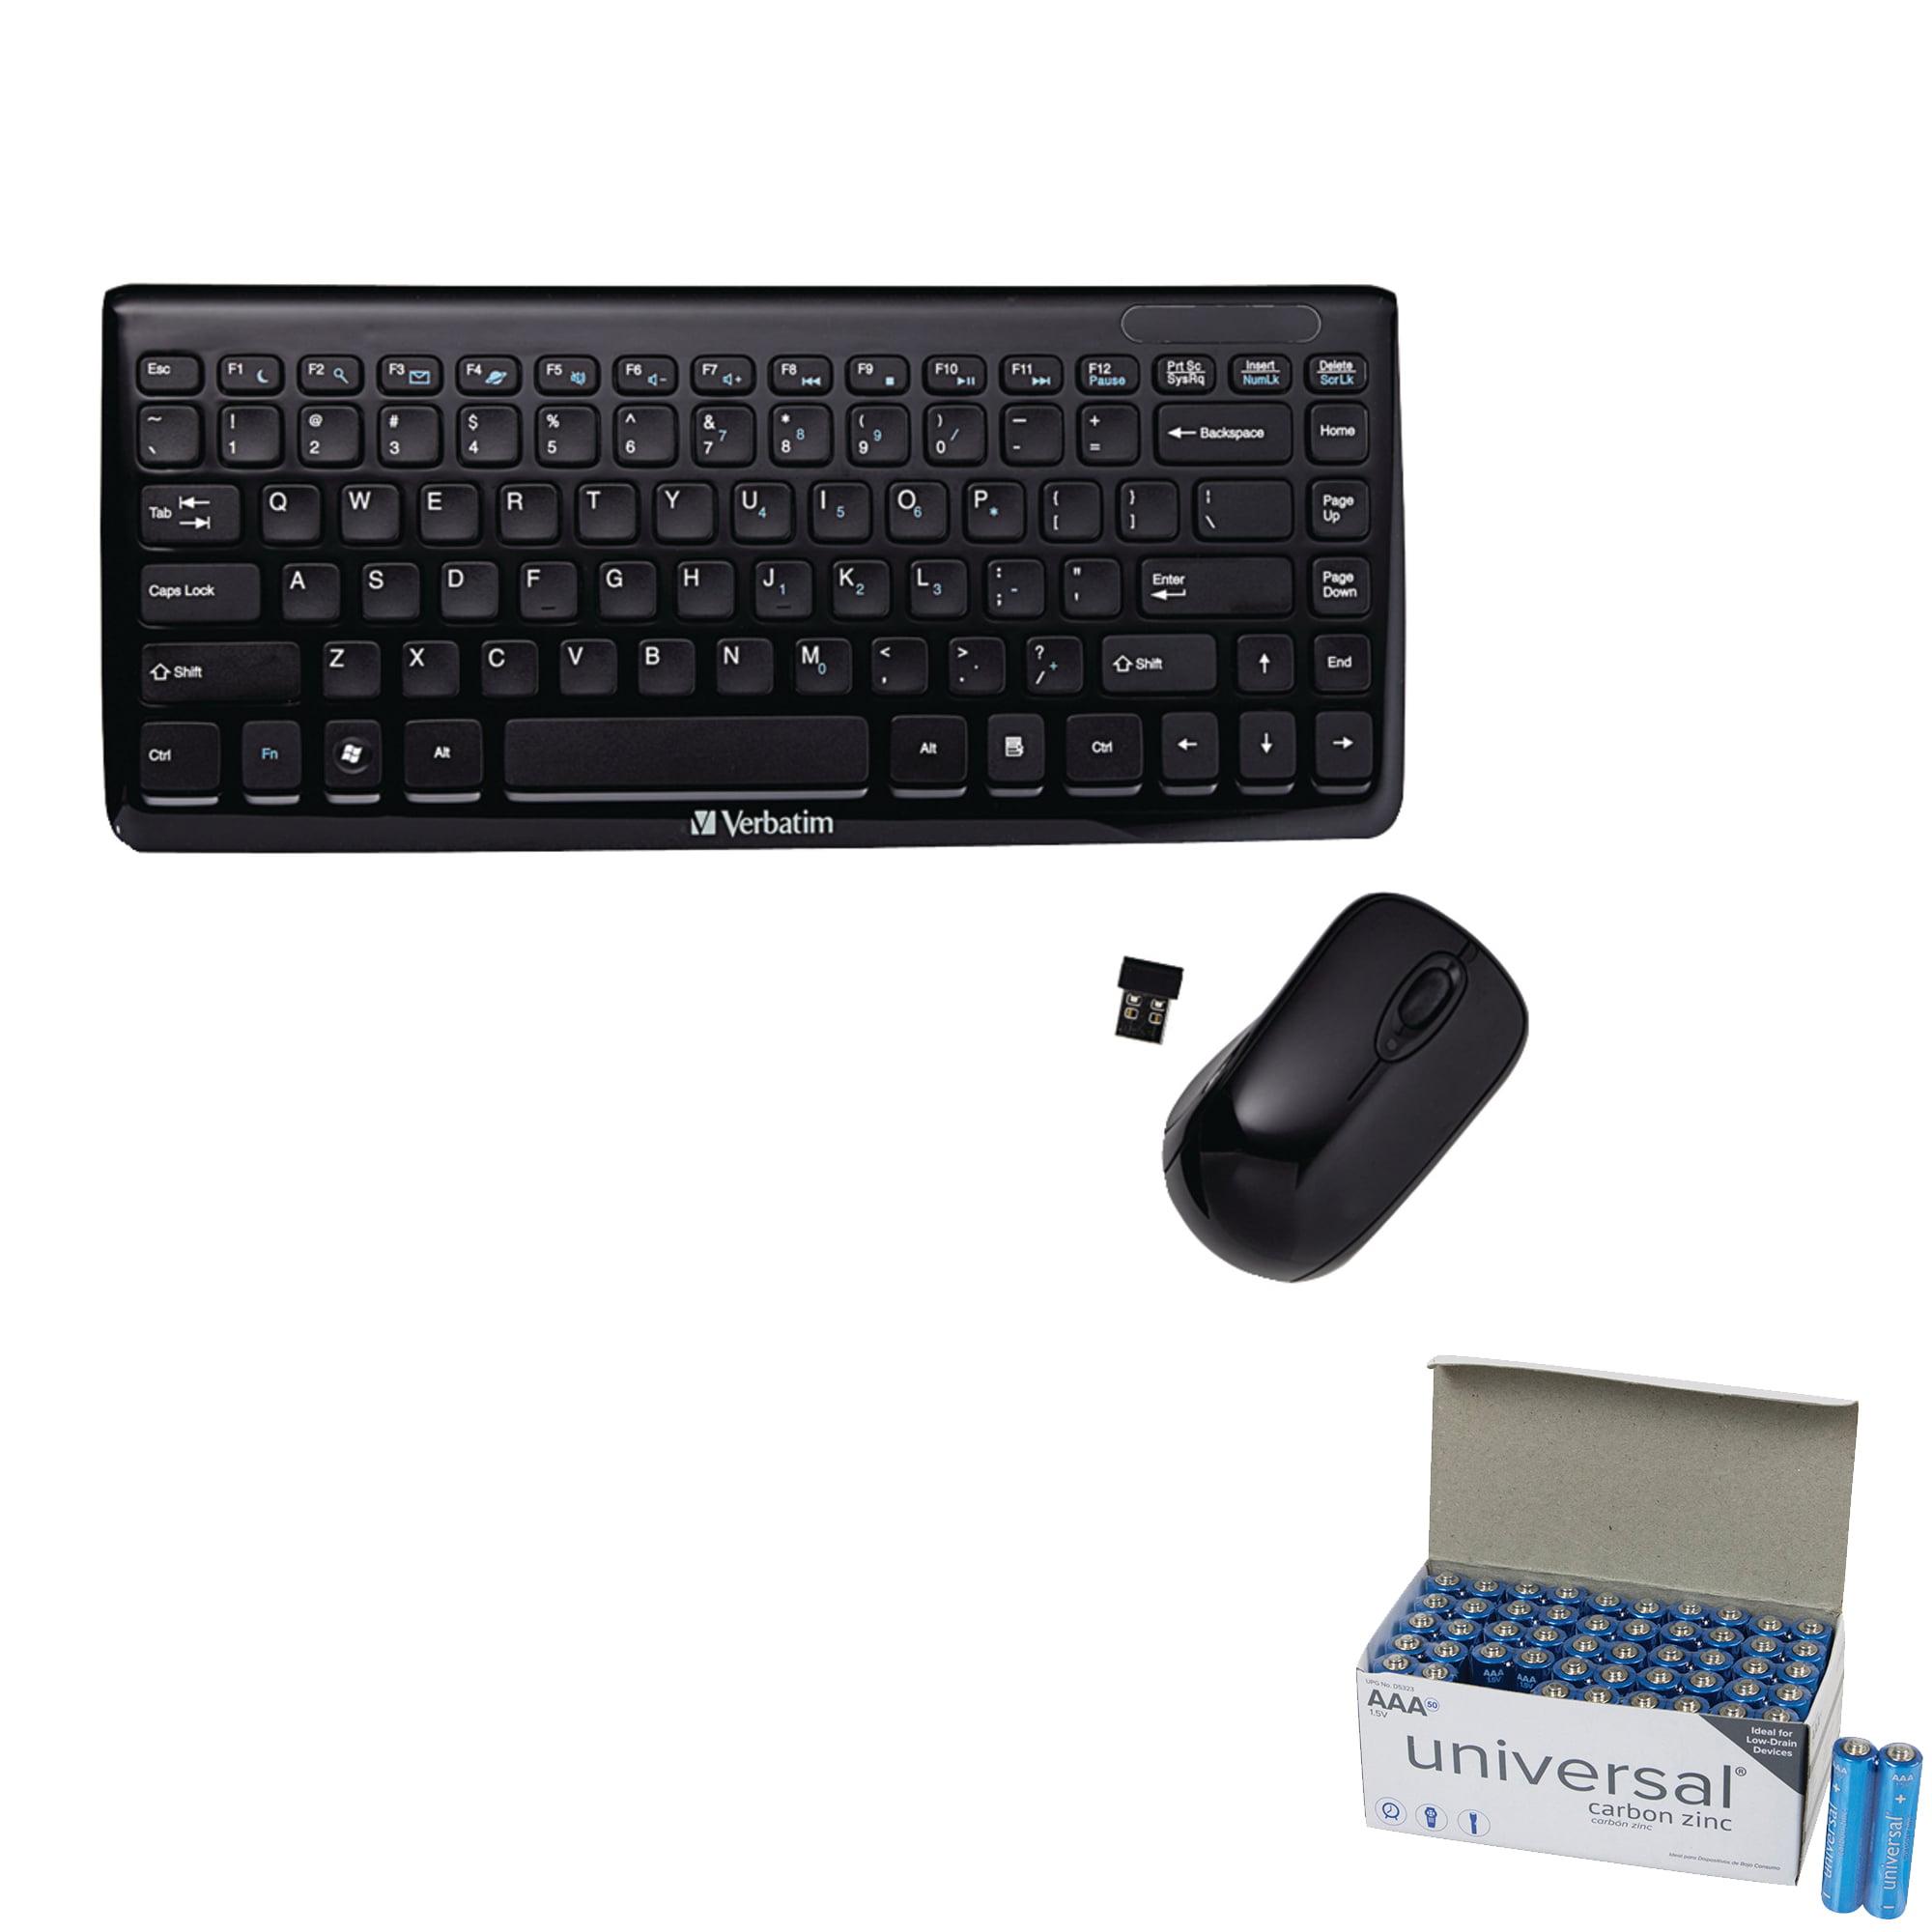 Verbatim 97472 Mini Wireless Slim Keyboard & Mouse & UPG AAA 50 Pack